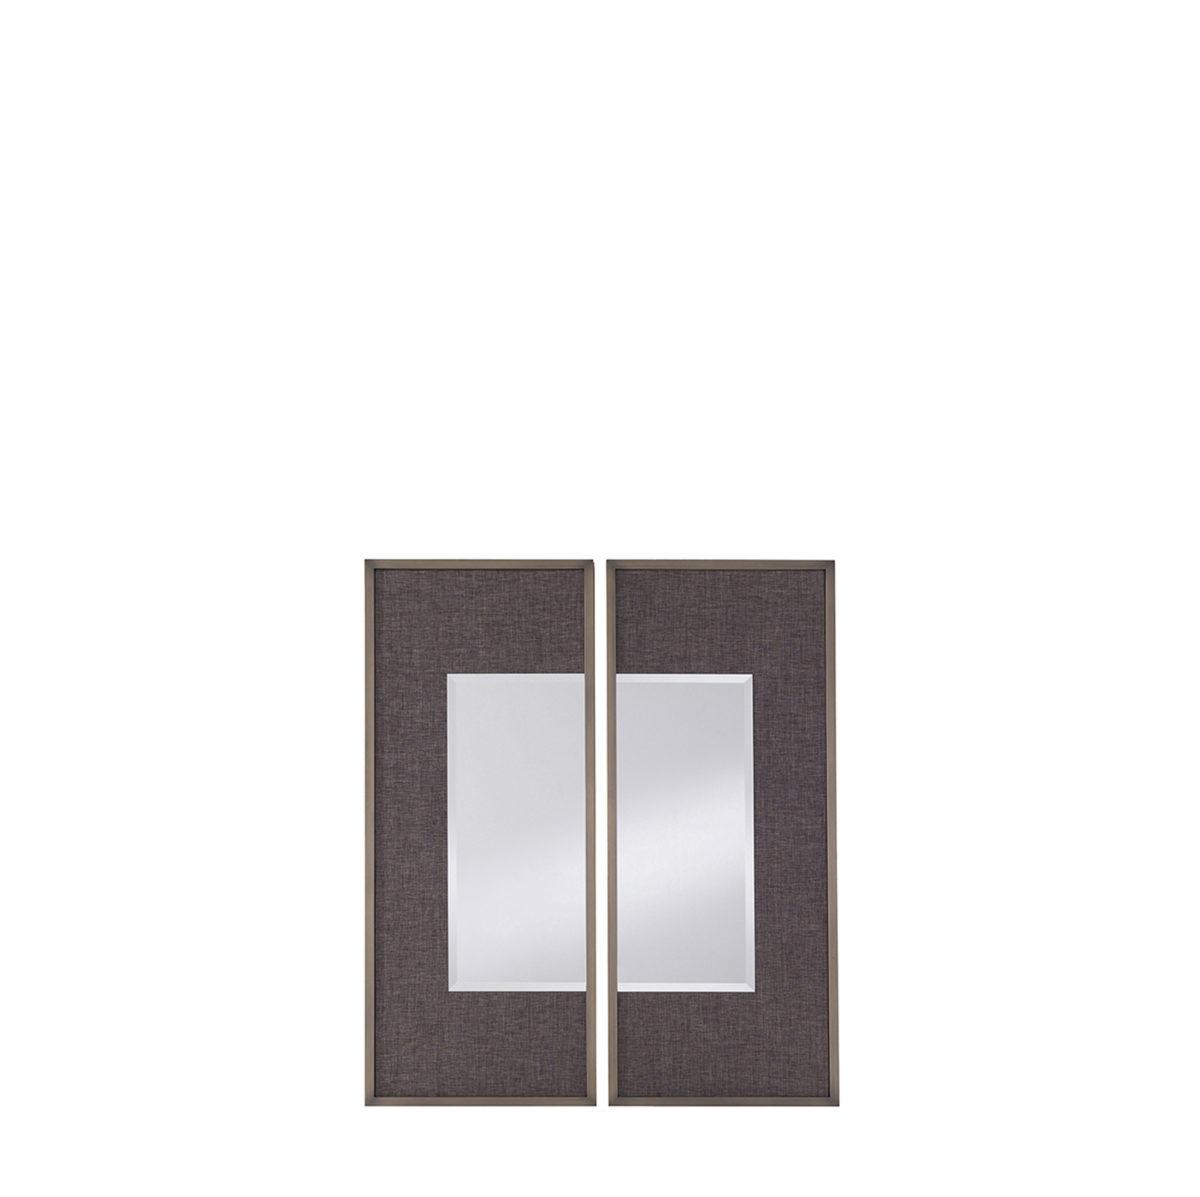 Gianfranco Ferre Home Connery Mirror